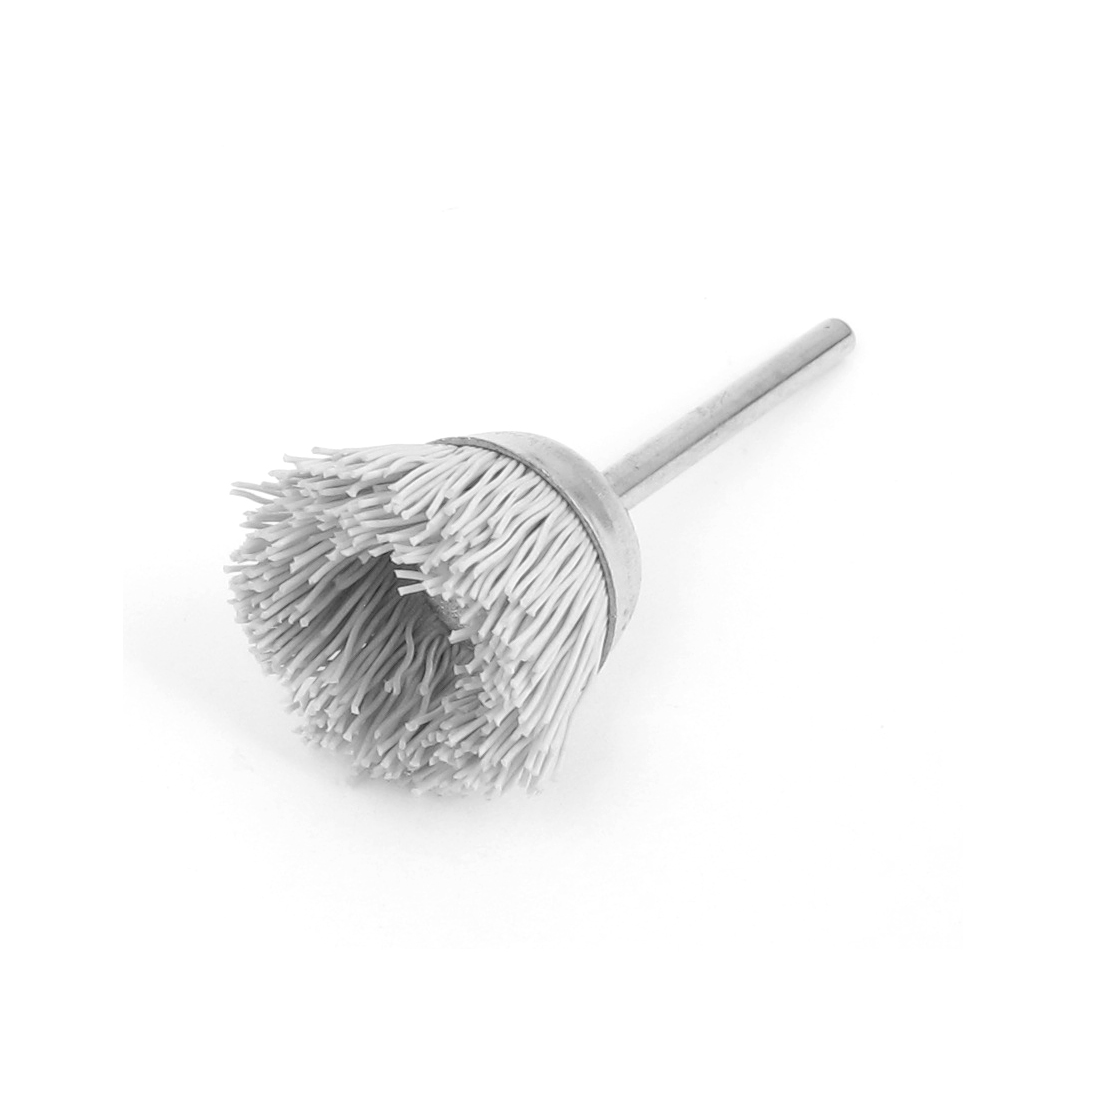 Rotary Tool 25mm Dia Nylon Head Jewelry Buffing Polishing Wheels Brushes